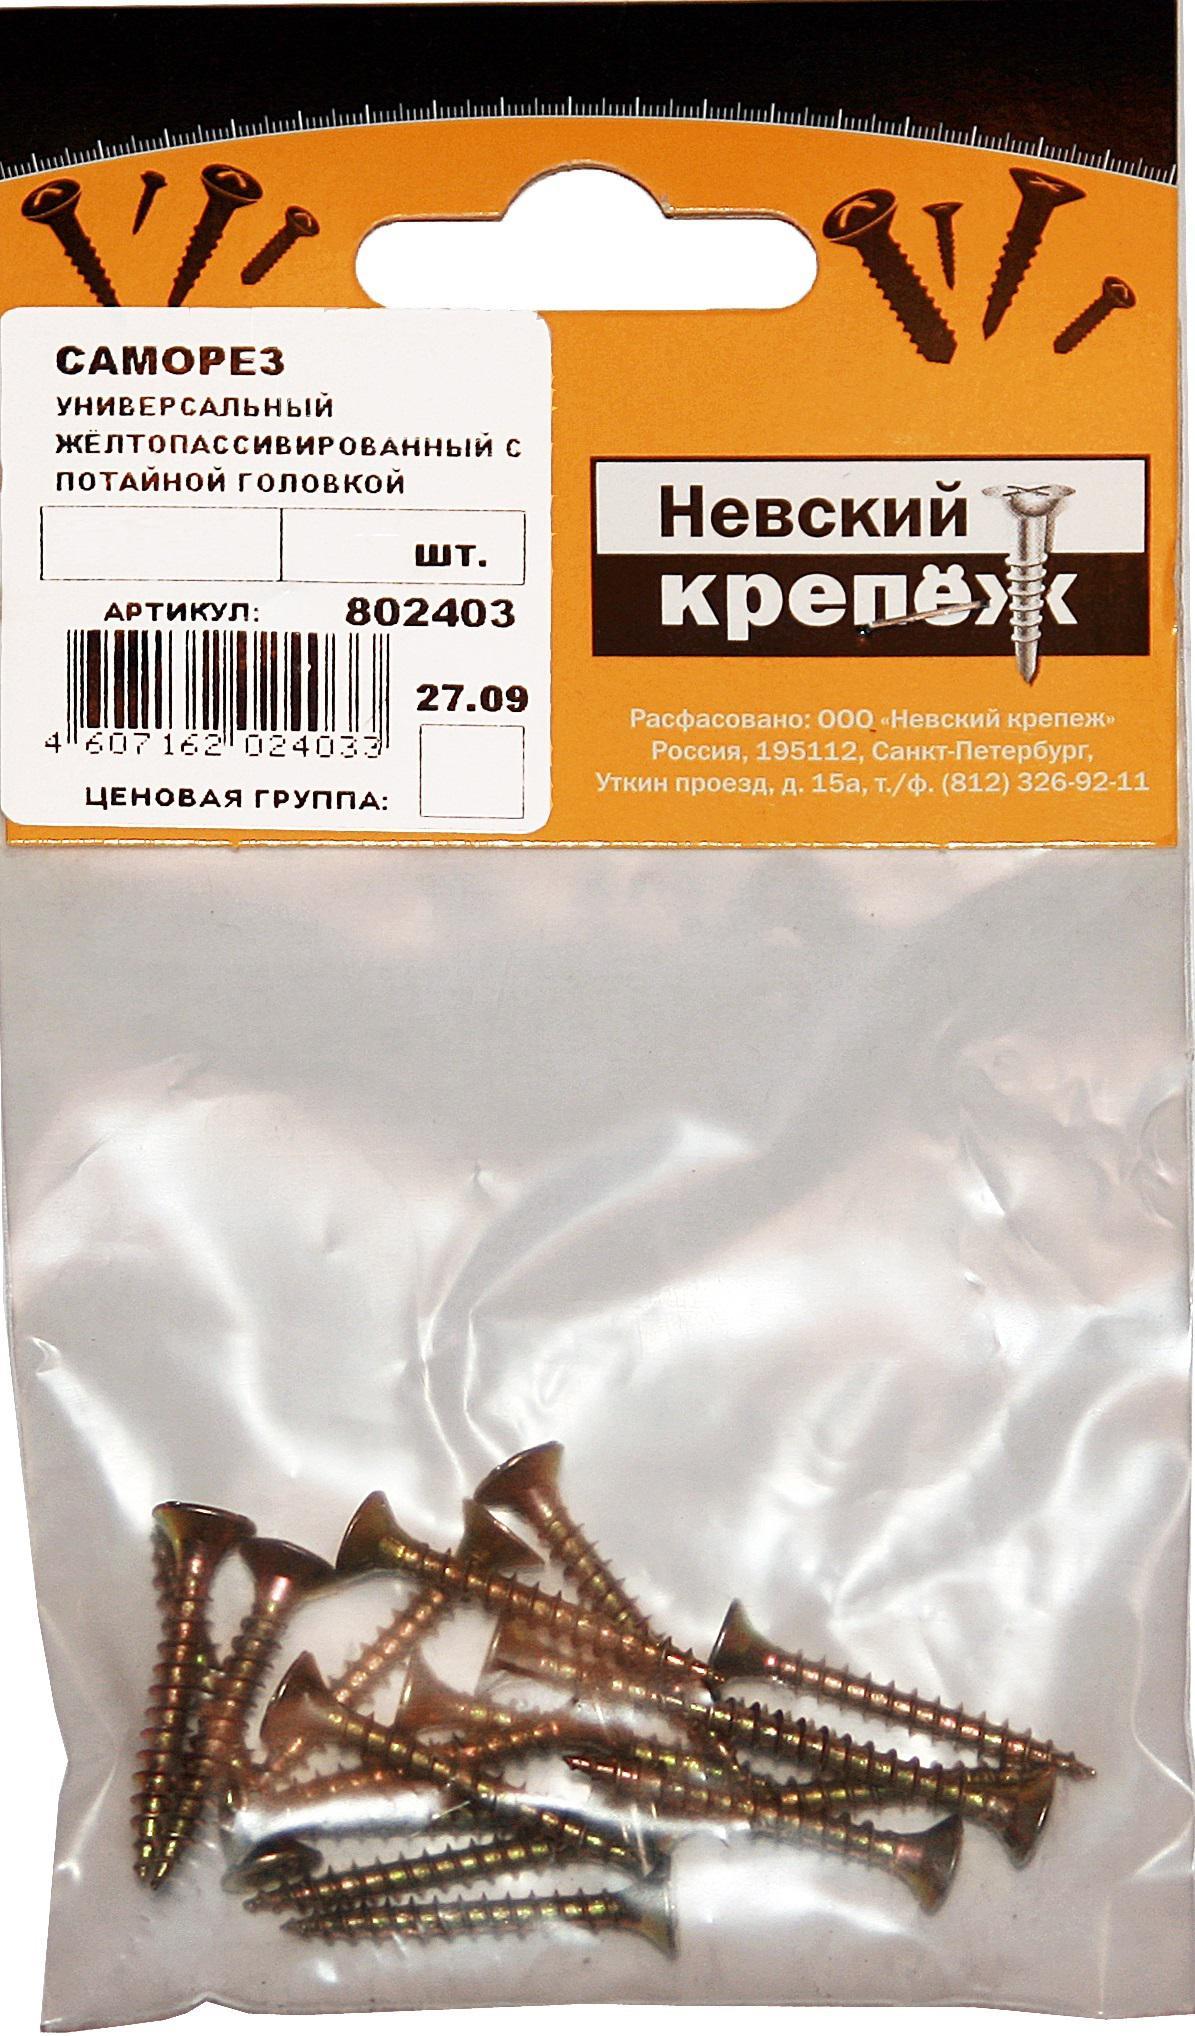 Саморез НЕВСКИЙ КРЕПЕЖ 802424